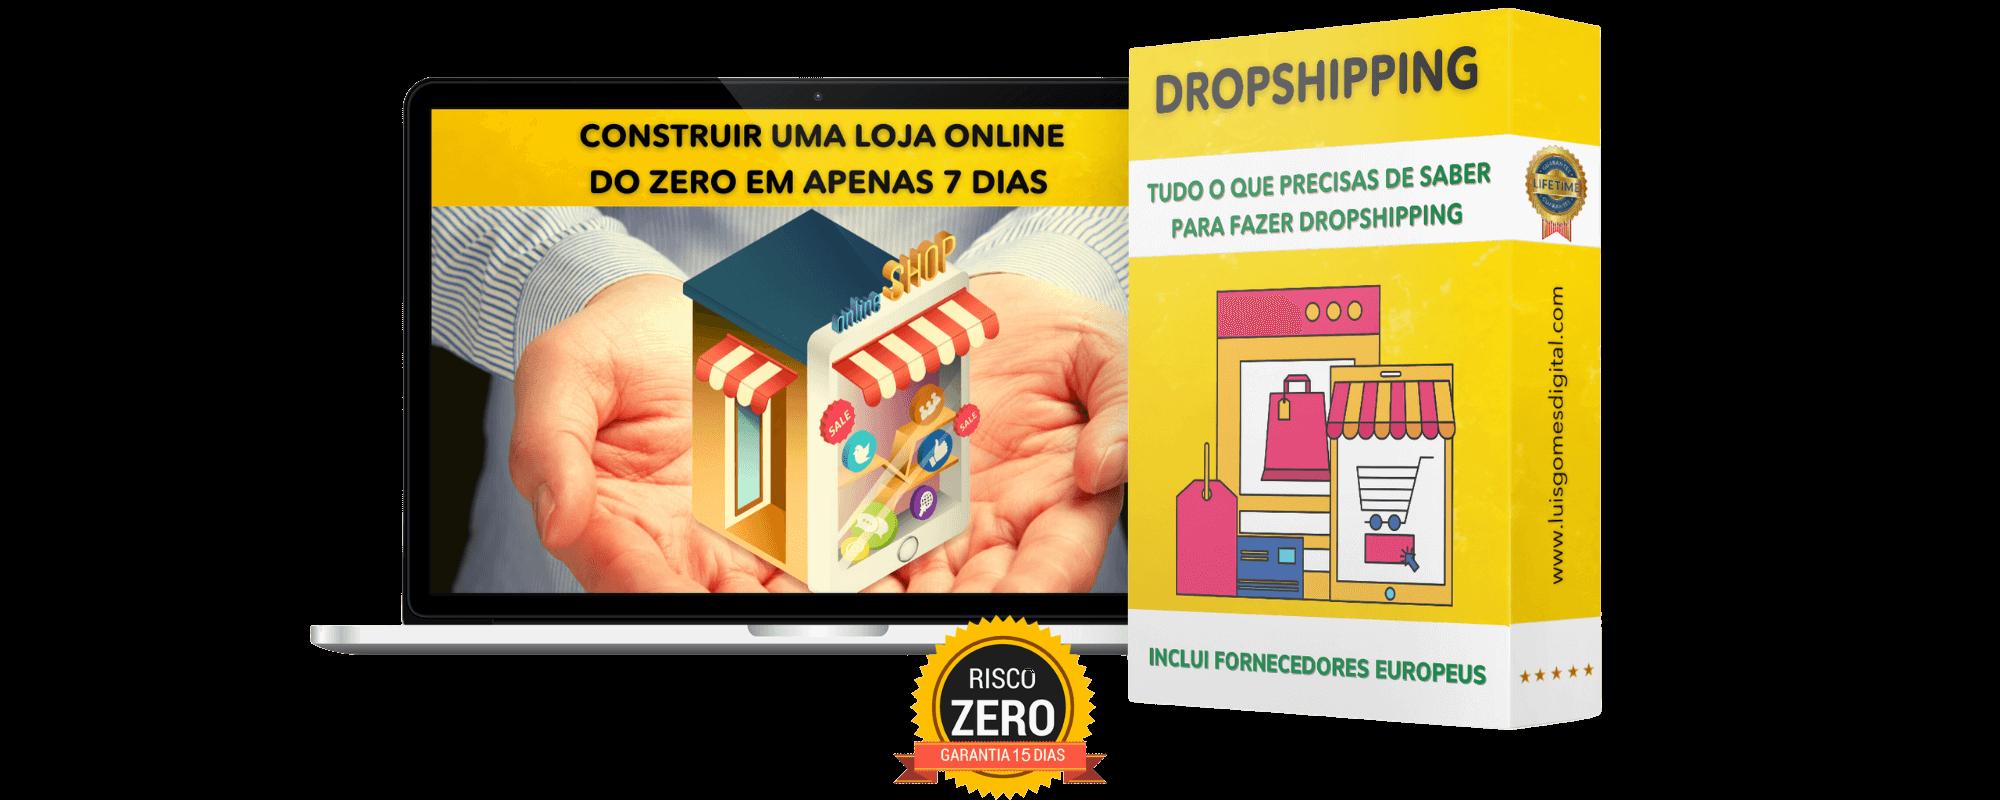 Curso online sobre e-commerce e dropshipping